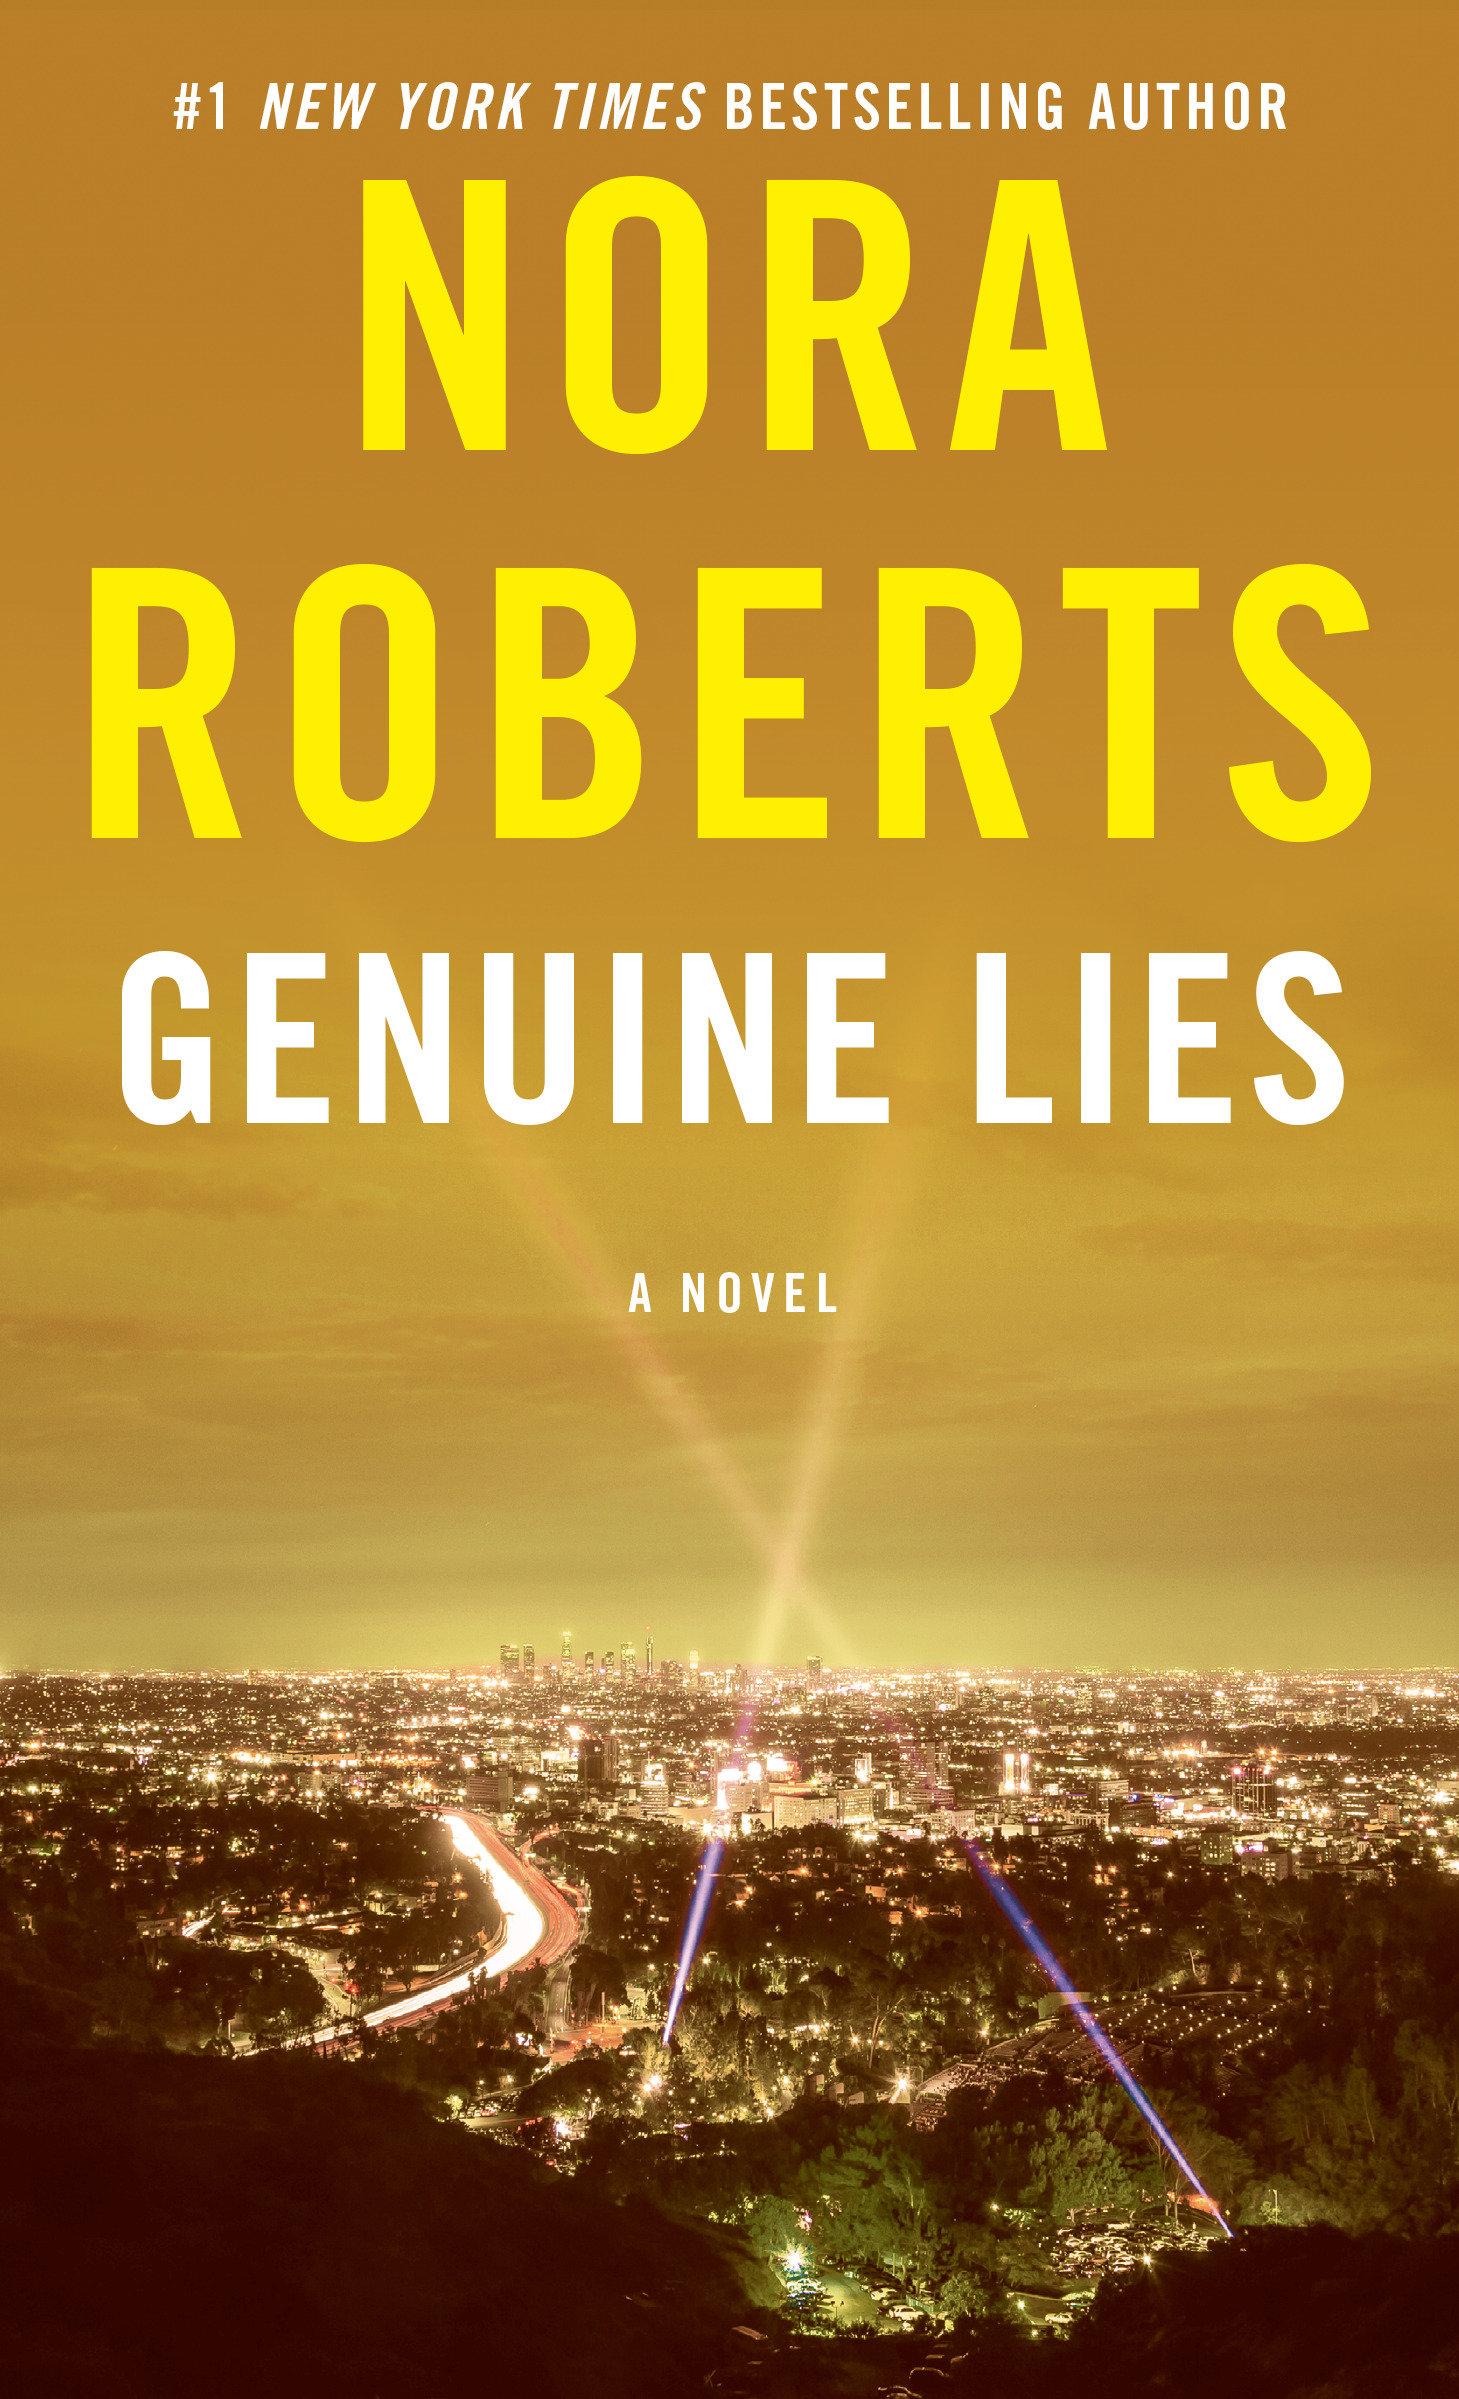 Genuine lies cover image